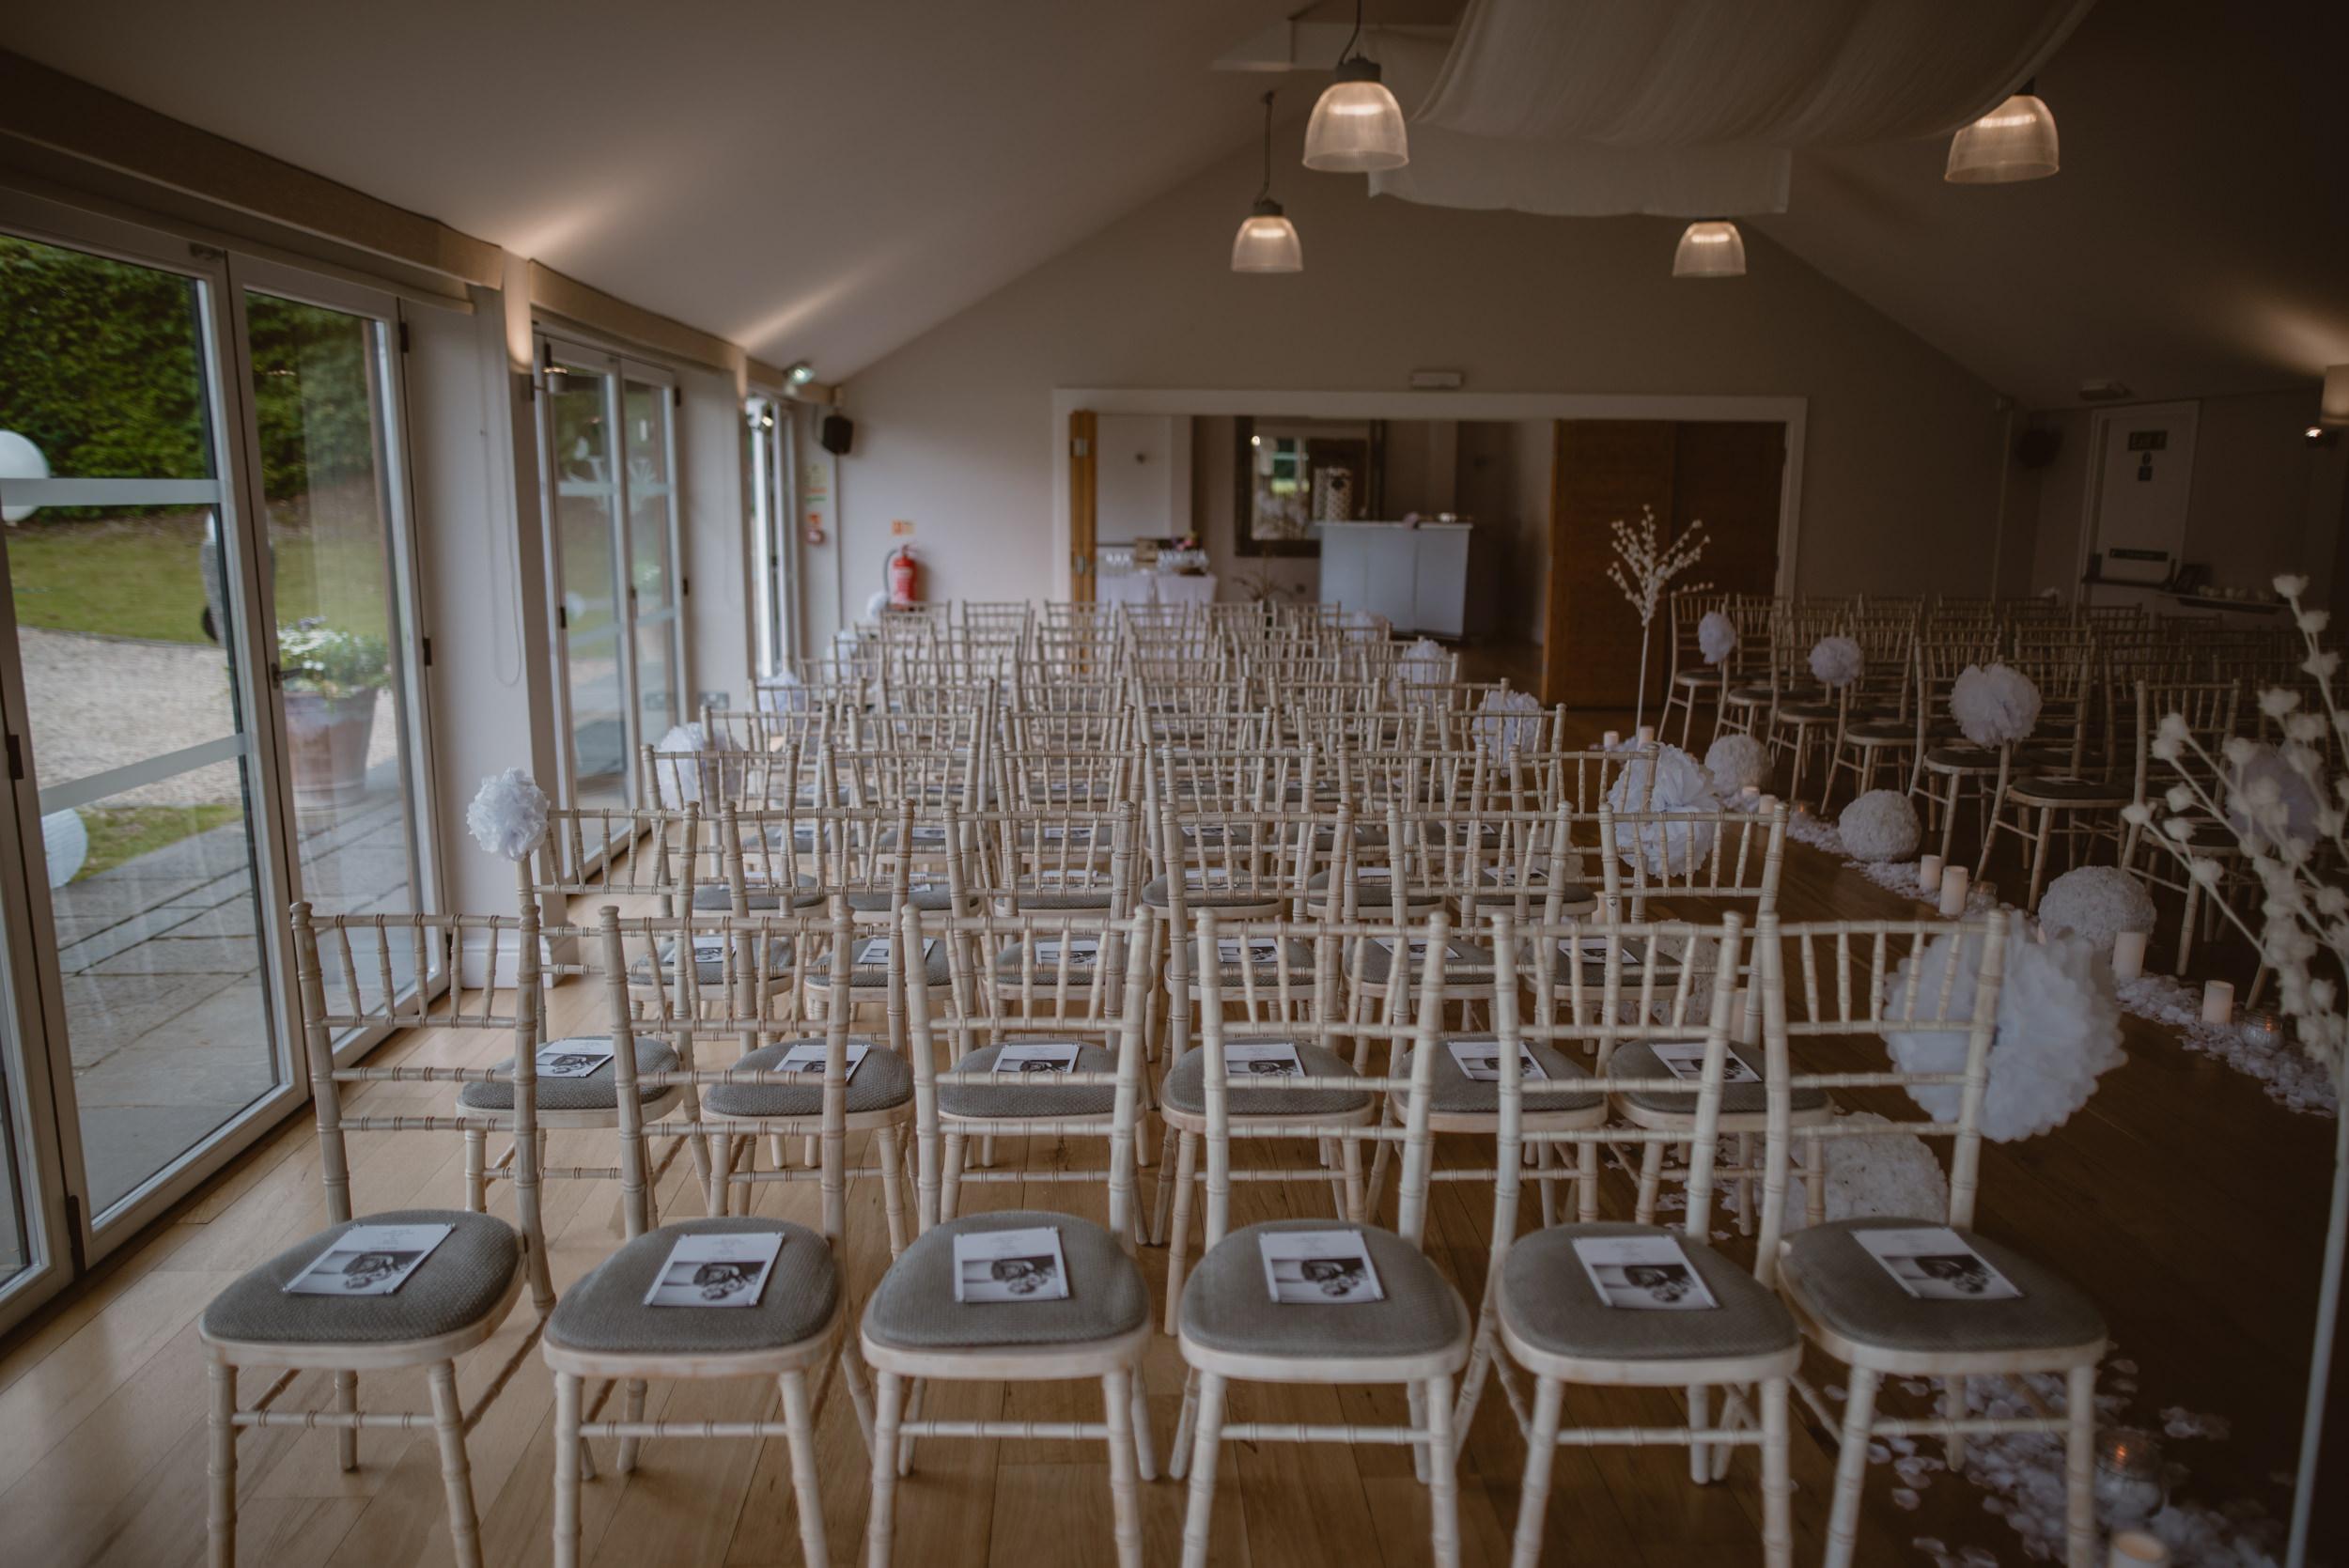 Barry-and-Chaz-wedding-Wasing-Park-Berkshire-Manu-Mendoza-Wedding-Photography-019.jpg